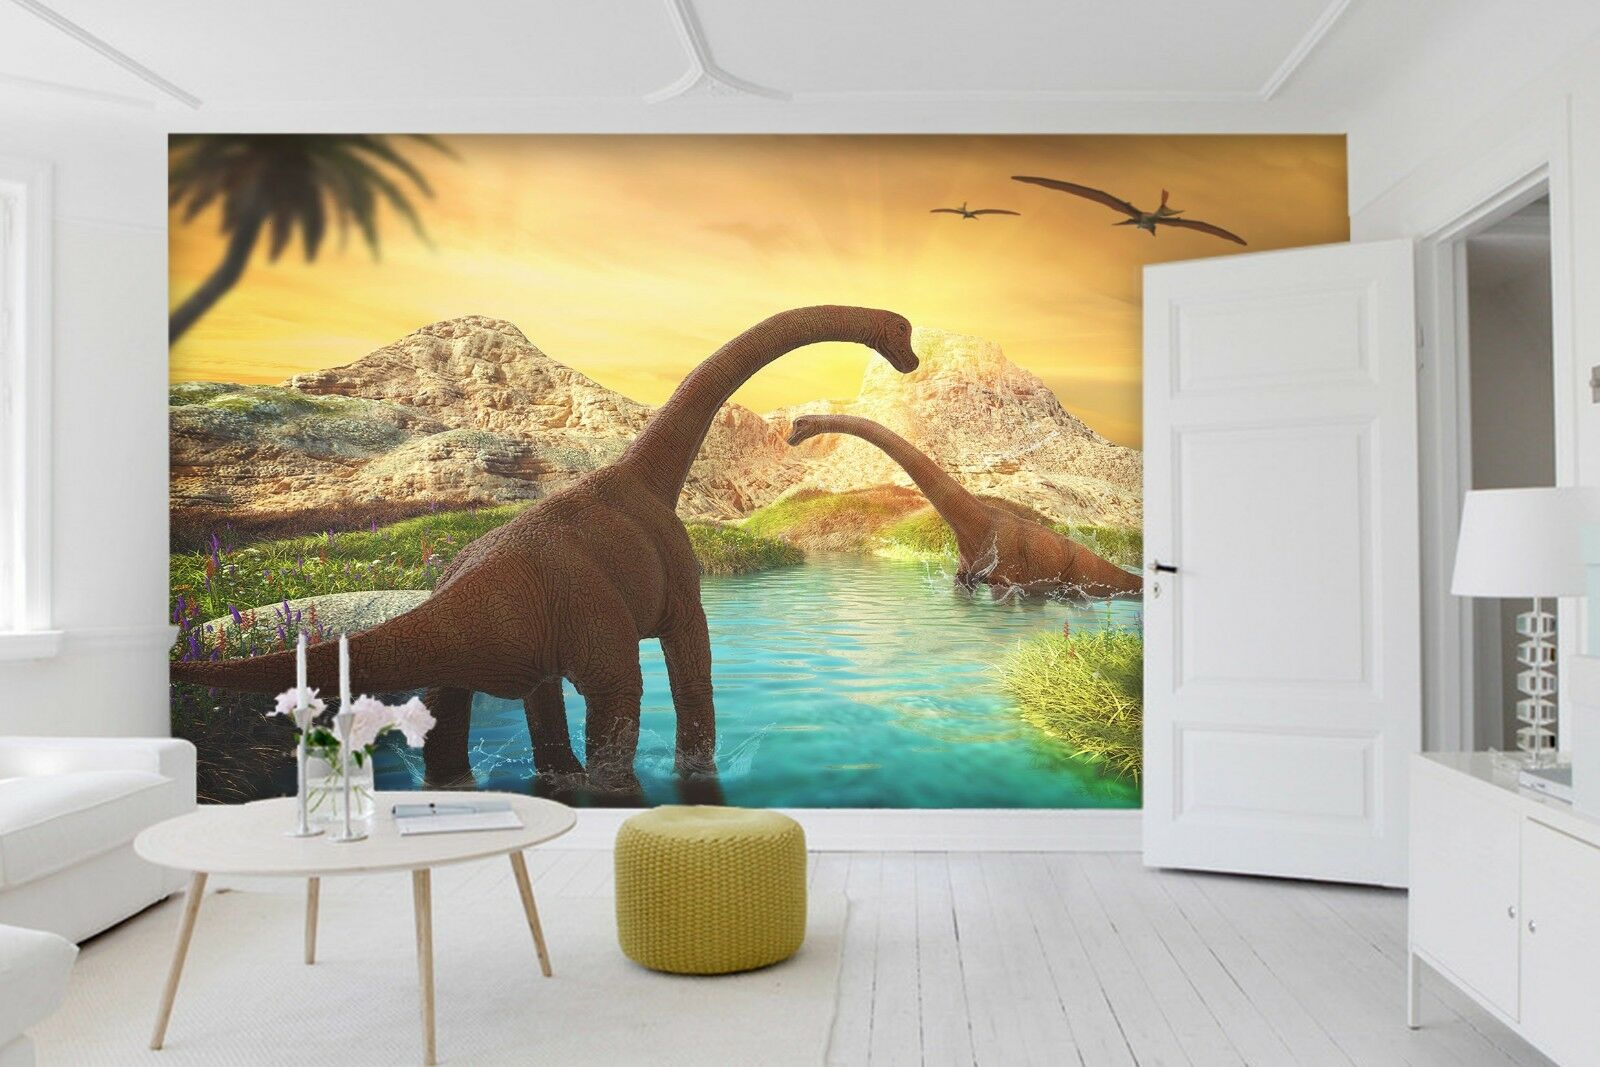 3D Dusk River Dinosaur 8 Wallpaper Mural Print Wall Indoor Wallpaper Murals UK